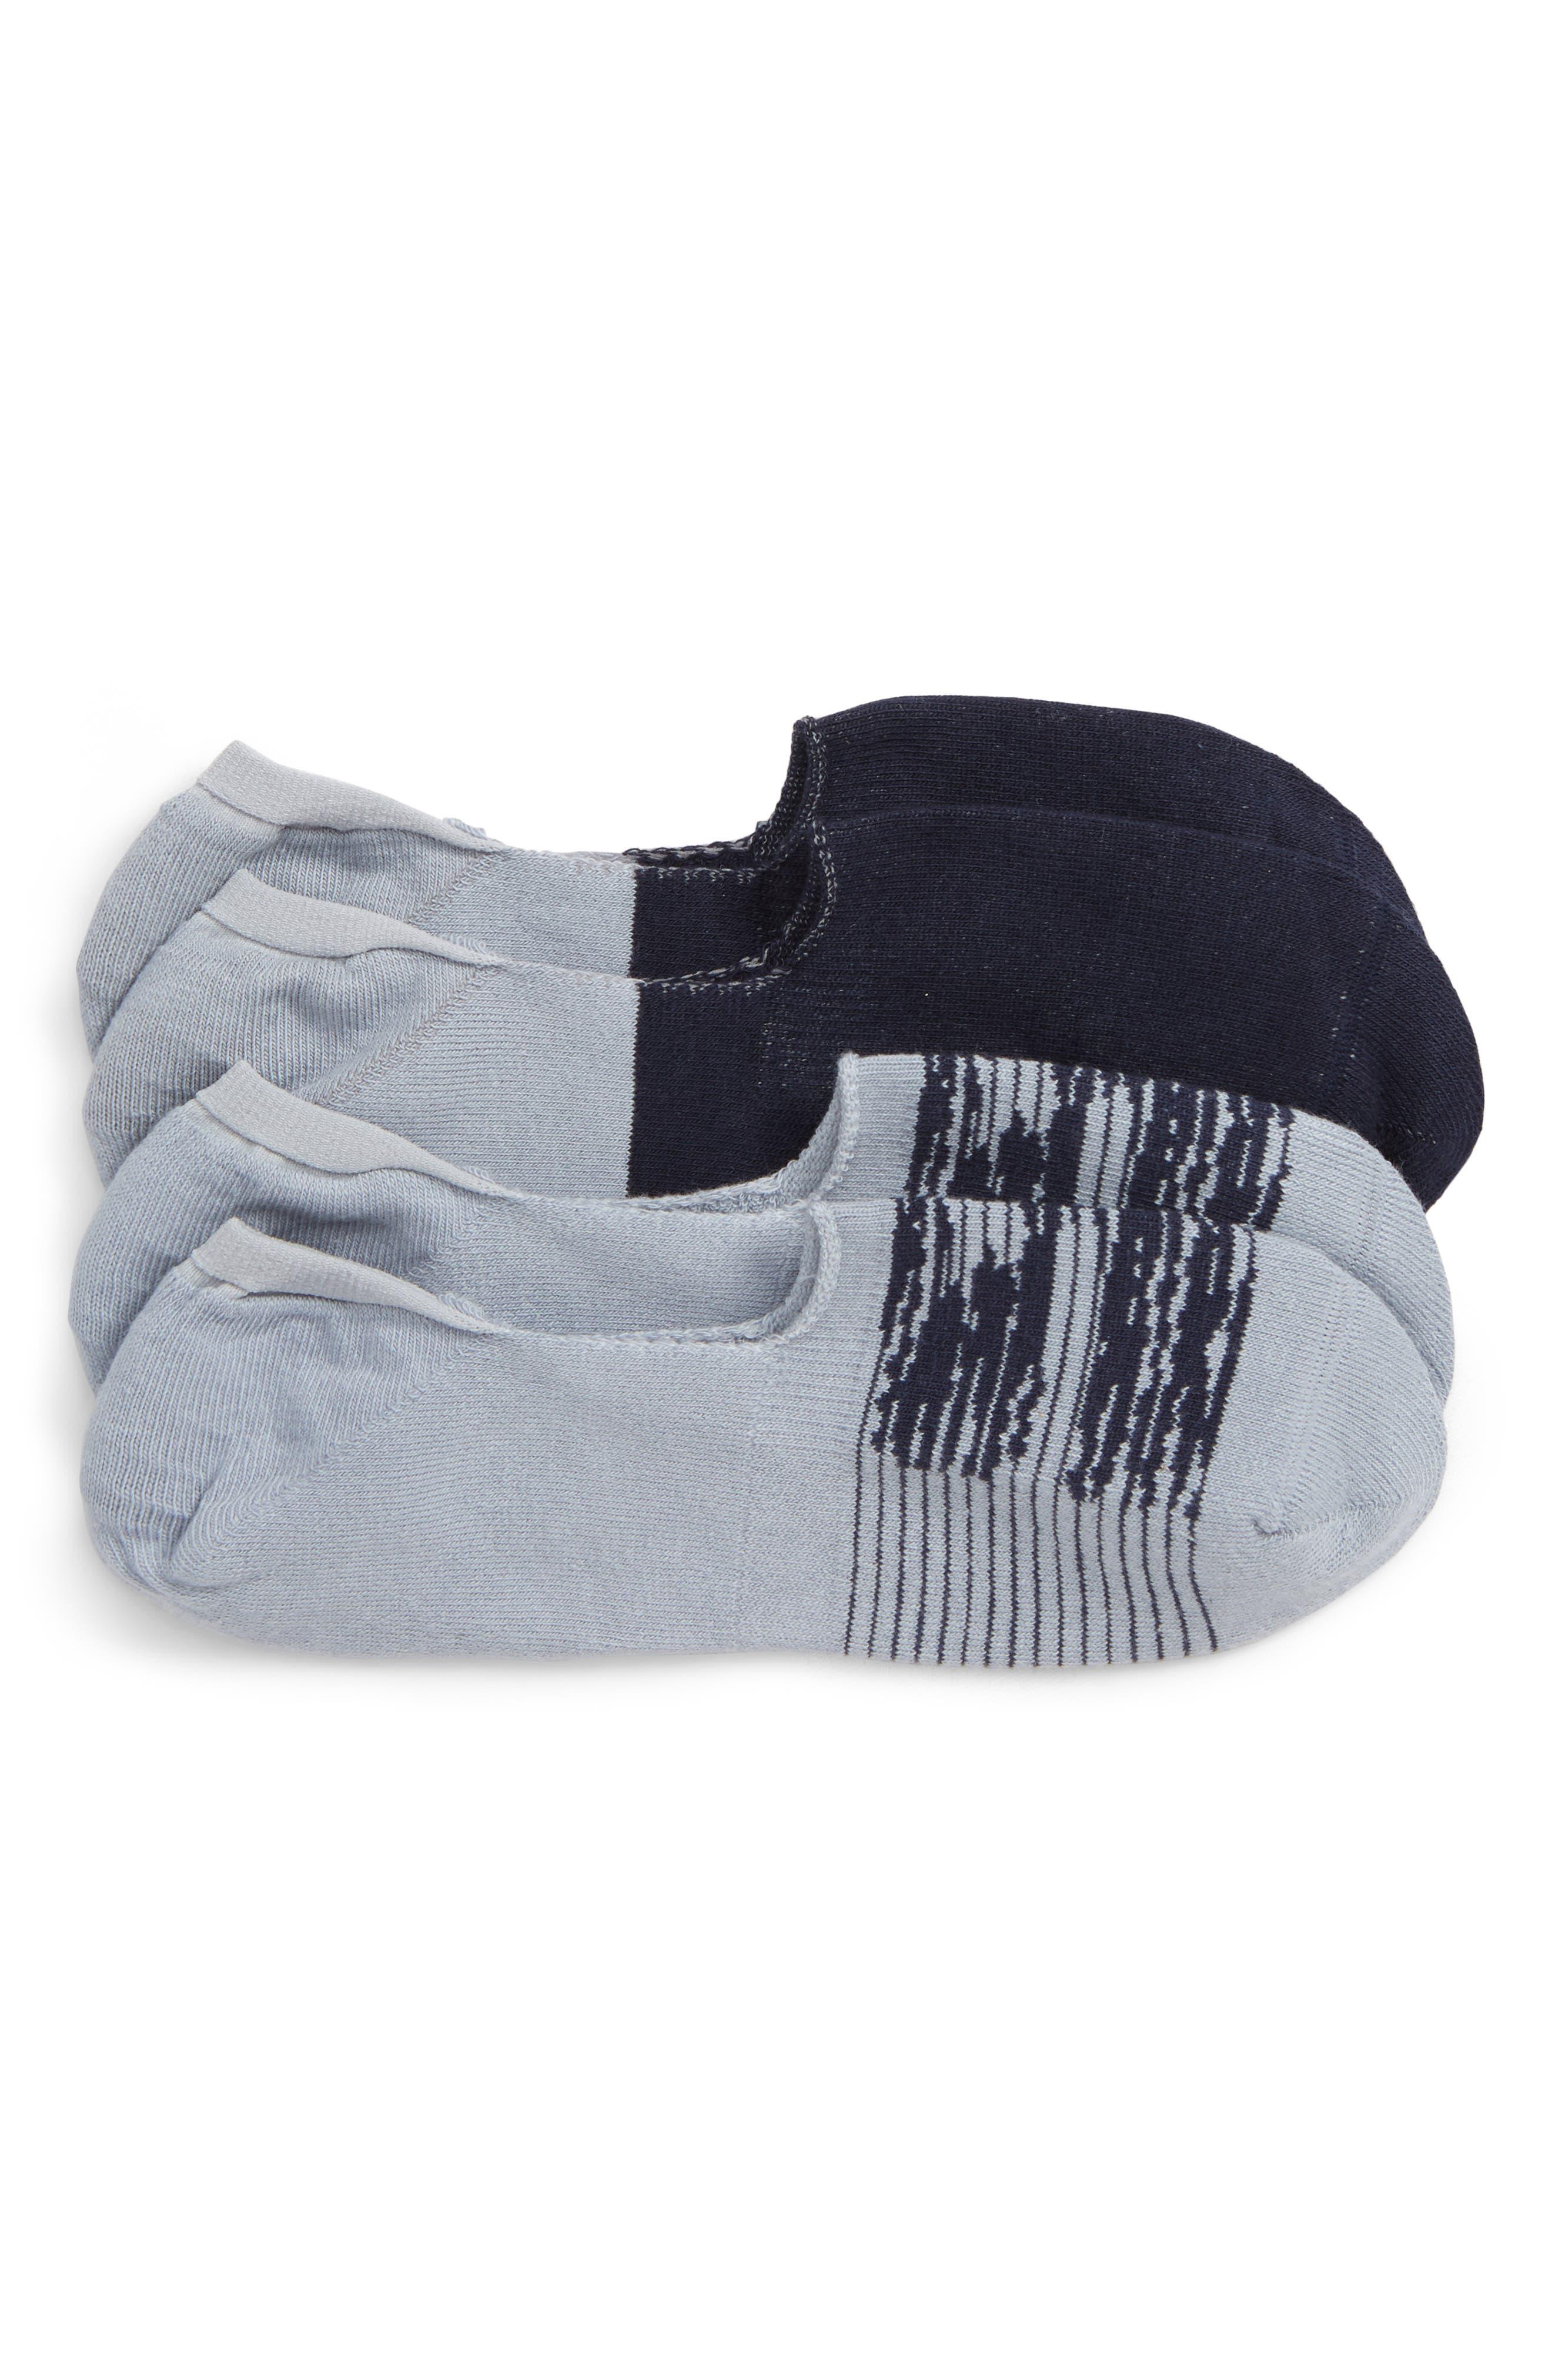 ,                             Assorted 2-Pack Liner Socks,                             Main thumbnail 1, color,                             GREY/ NAVY